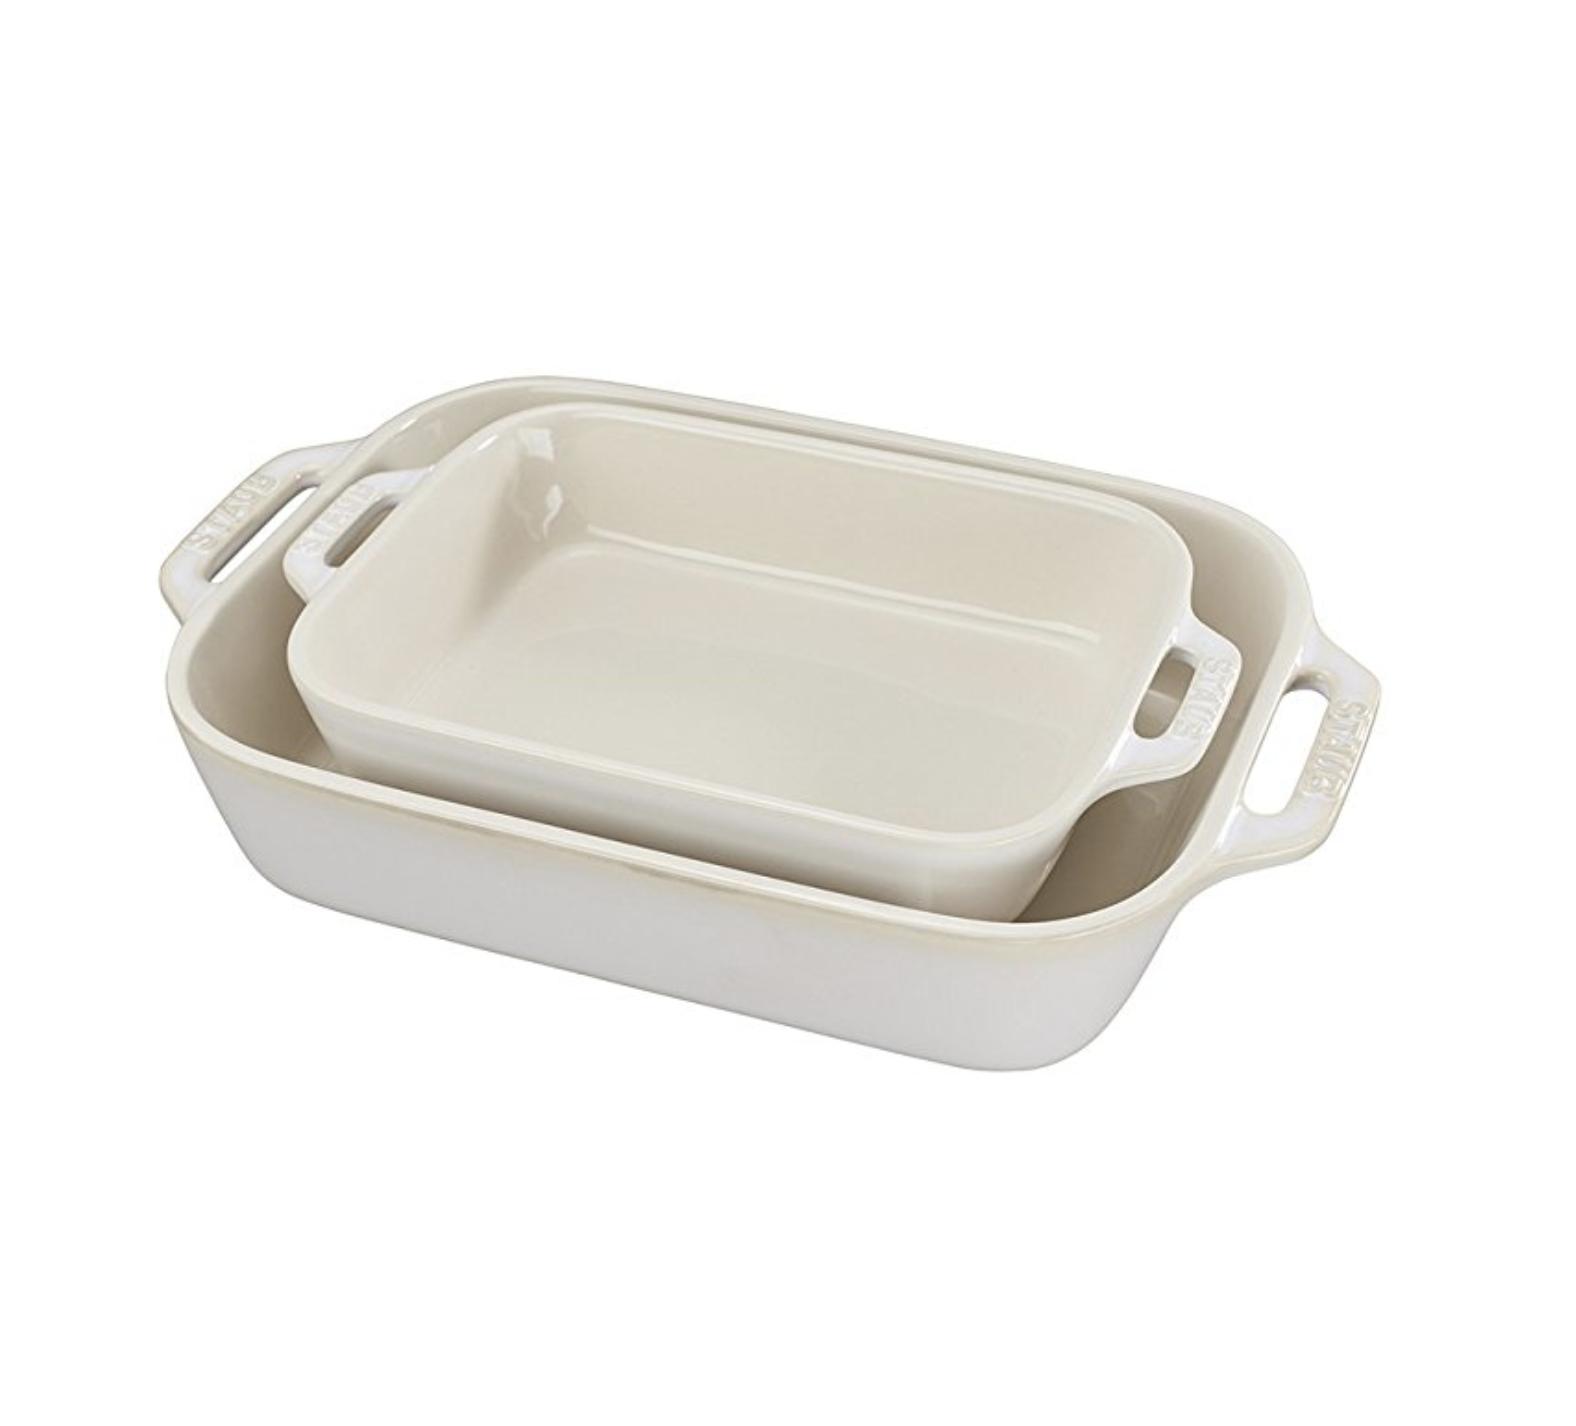 Staub Ceramic Baking Dish Set